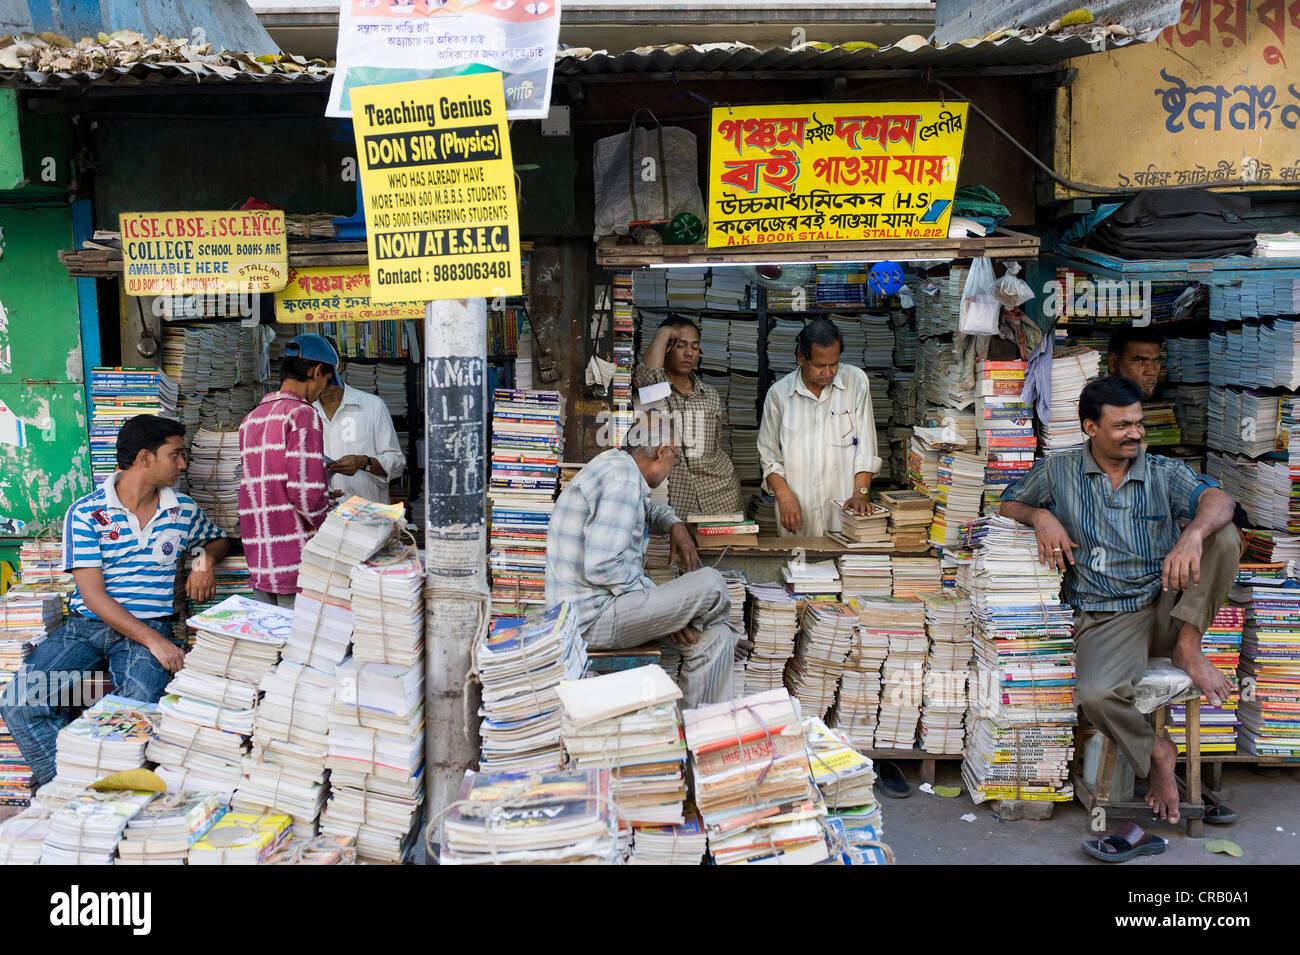 Book market, College Street, Kolkata, Calcutta, West Bengal, India, Asia - Stock Image